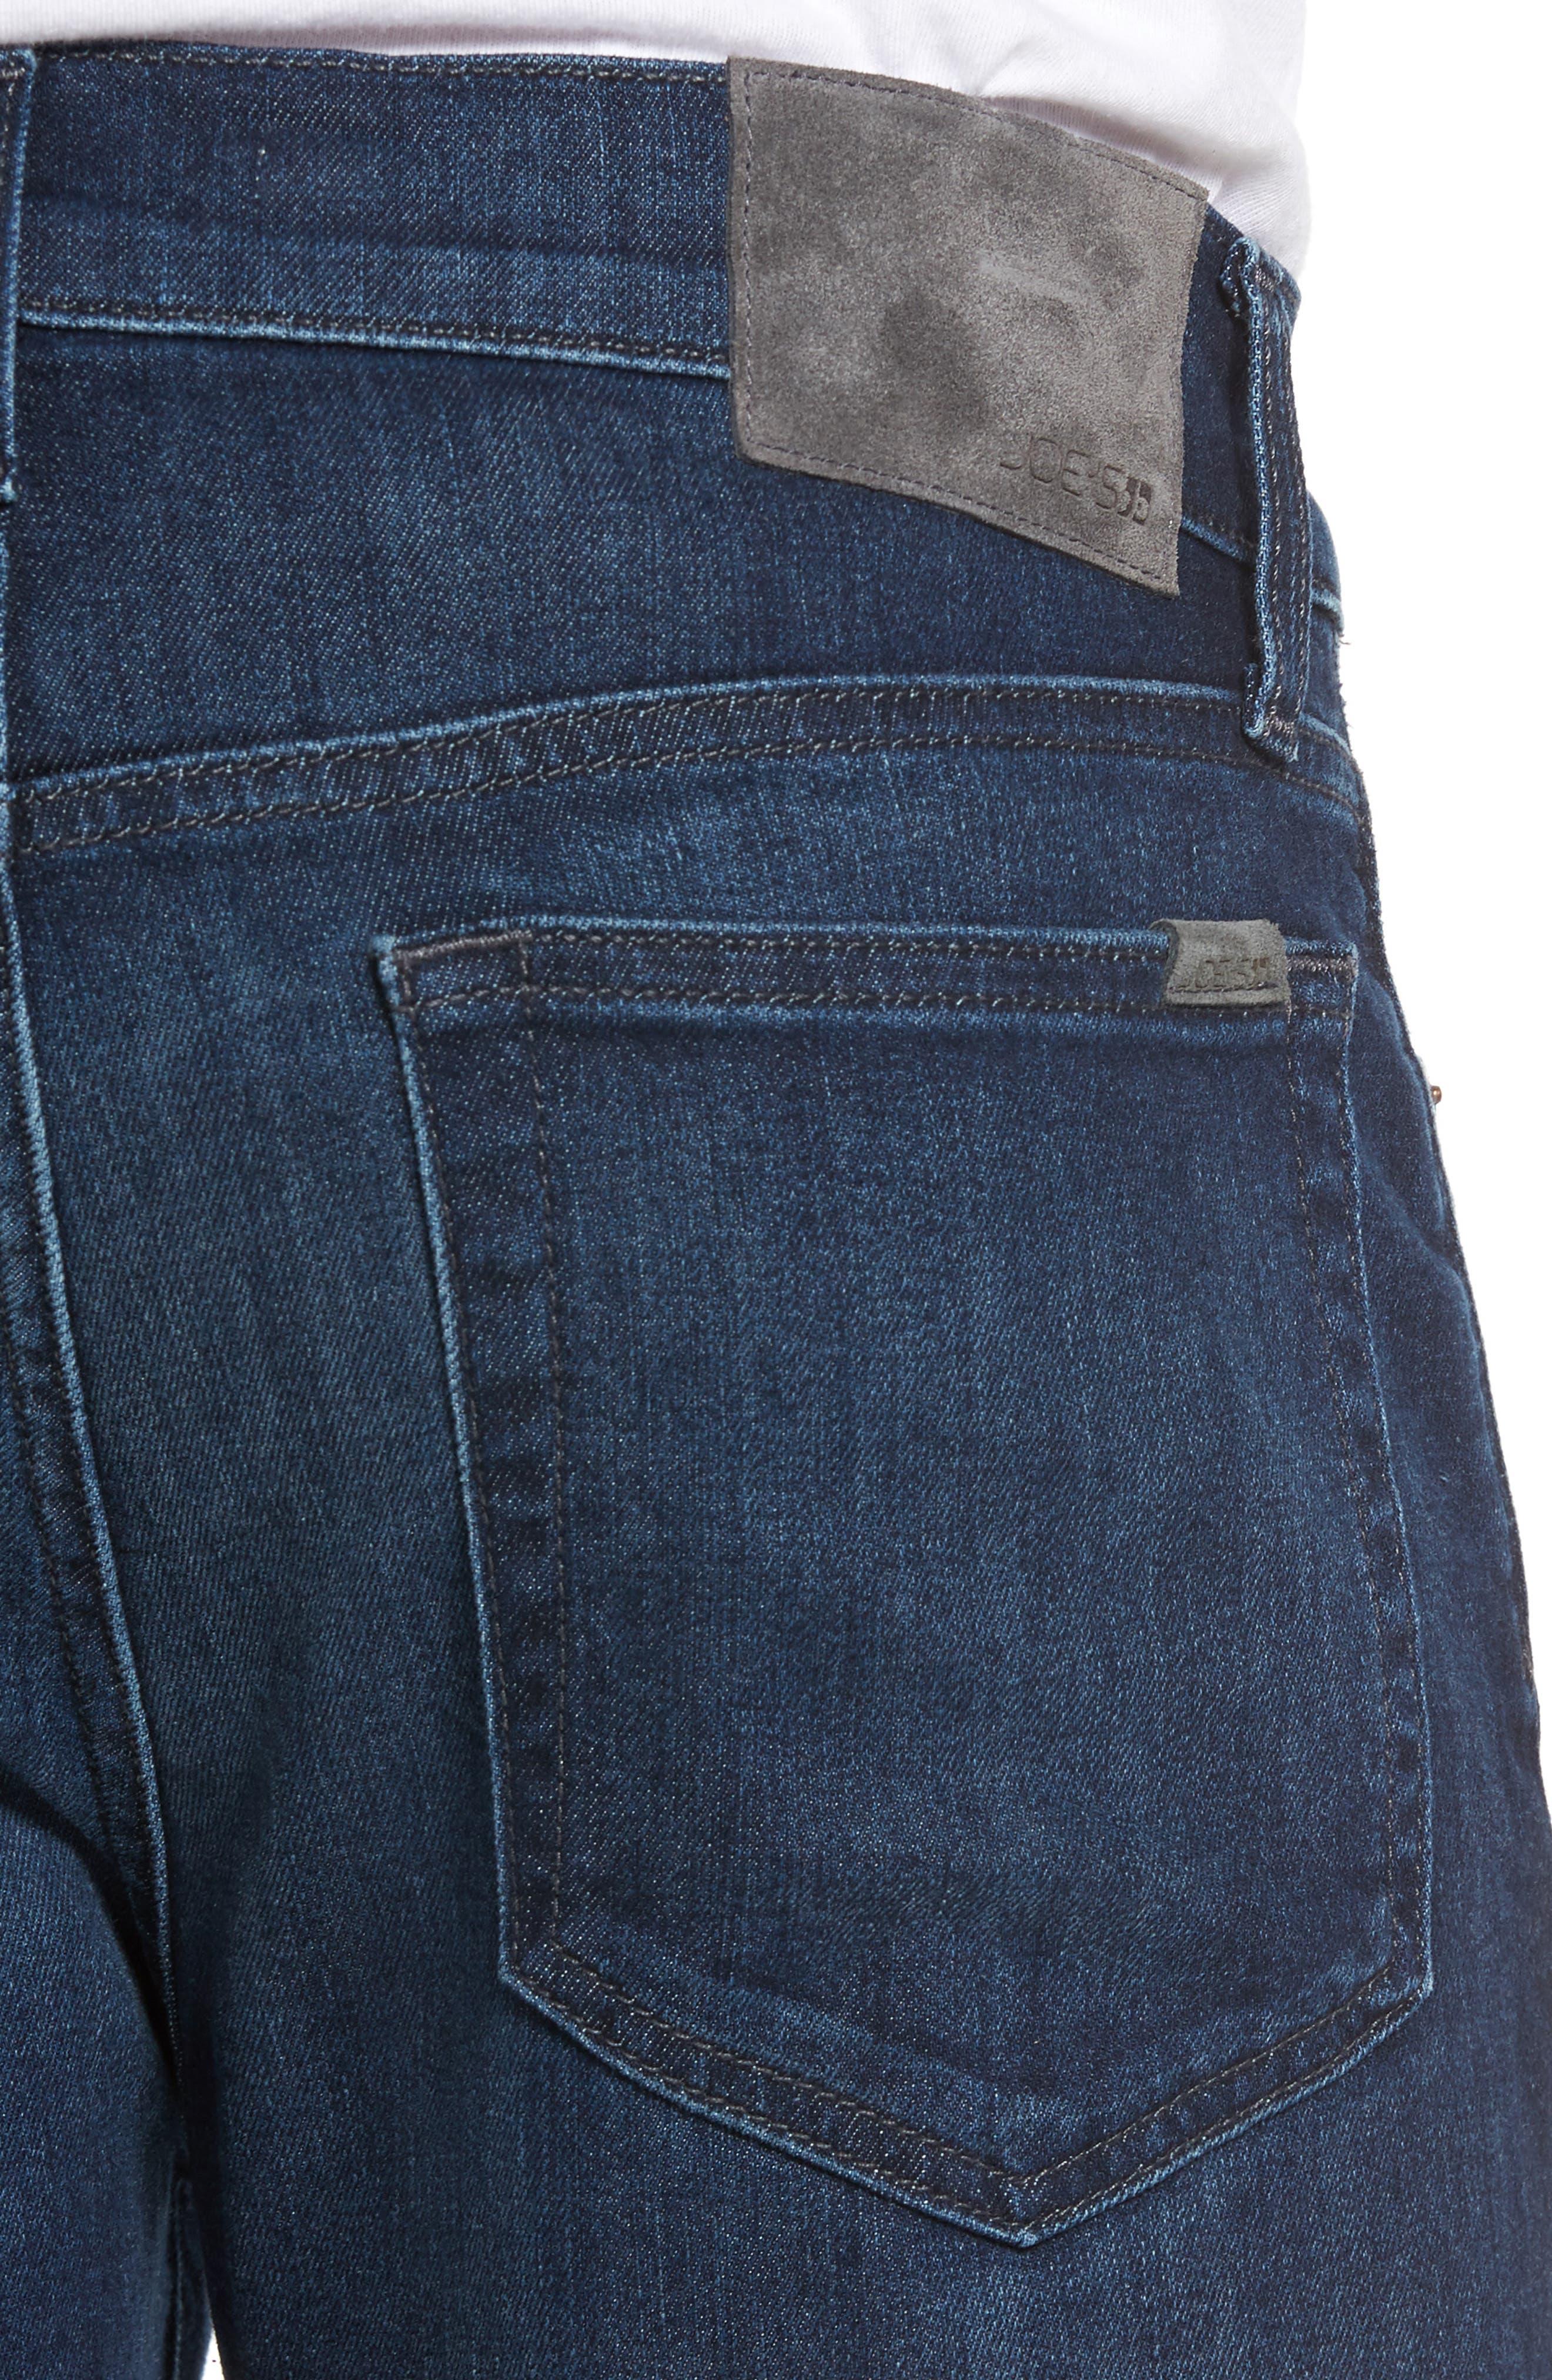 Slim Fit Jeans,                             Alternate thumbnail 4, color,                             Izaak